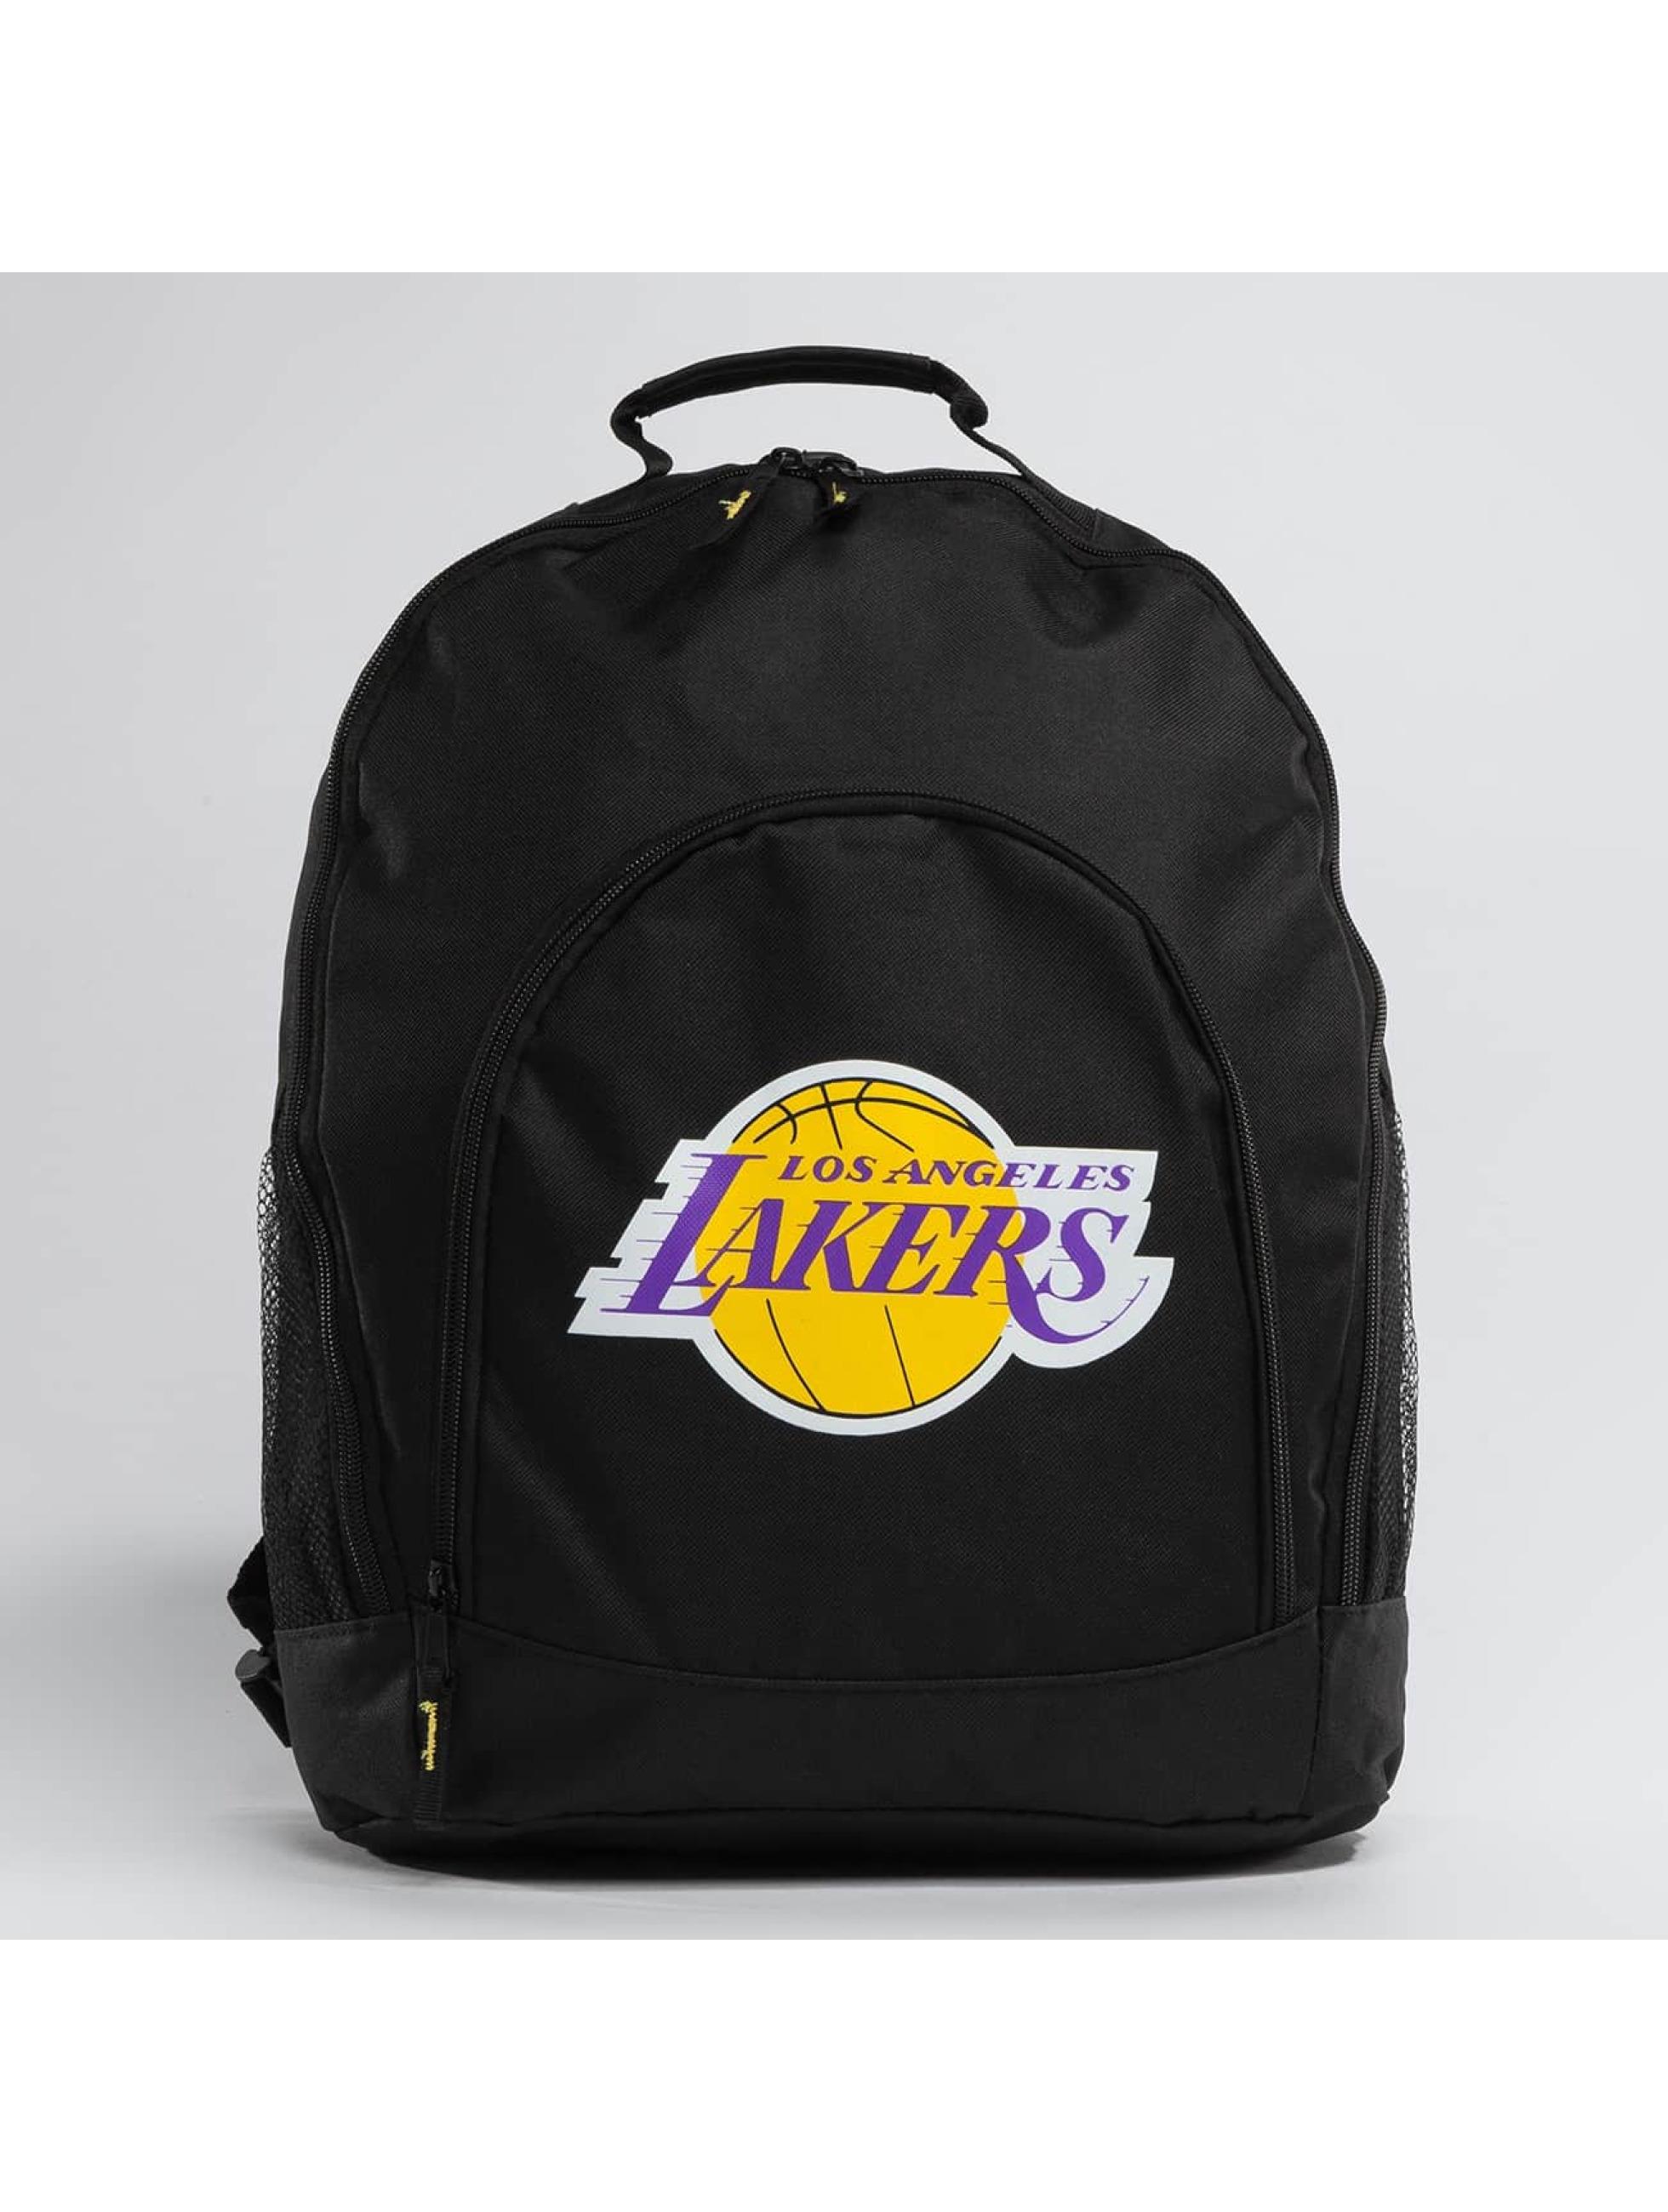 Forever Collectibles Bag NBA LA Lakers black